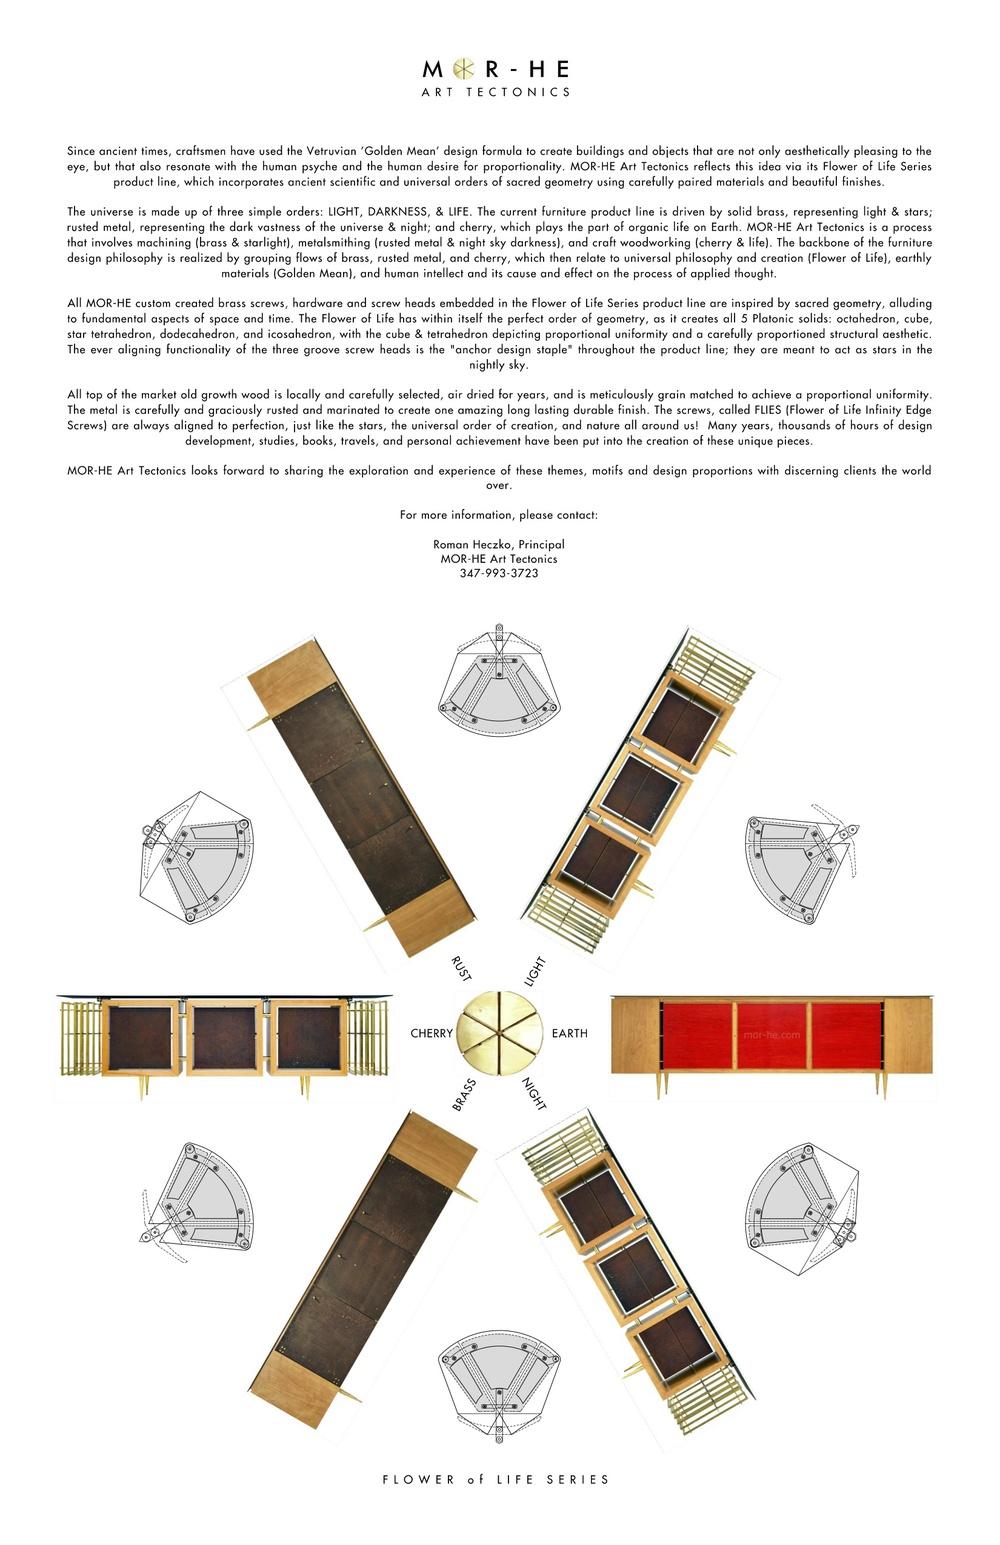 Mor-he Press Release 2014-11x17.jpg